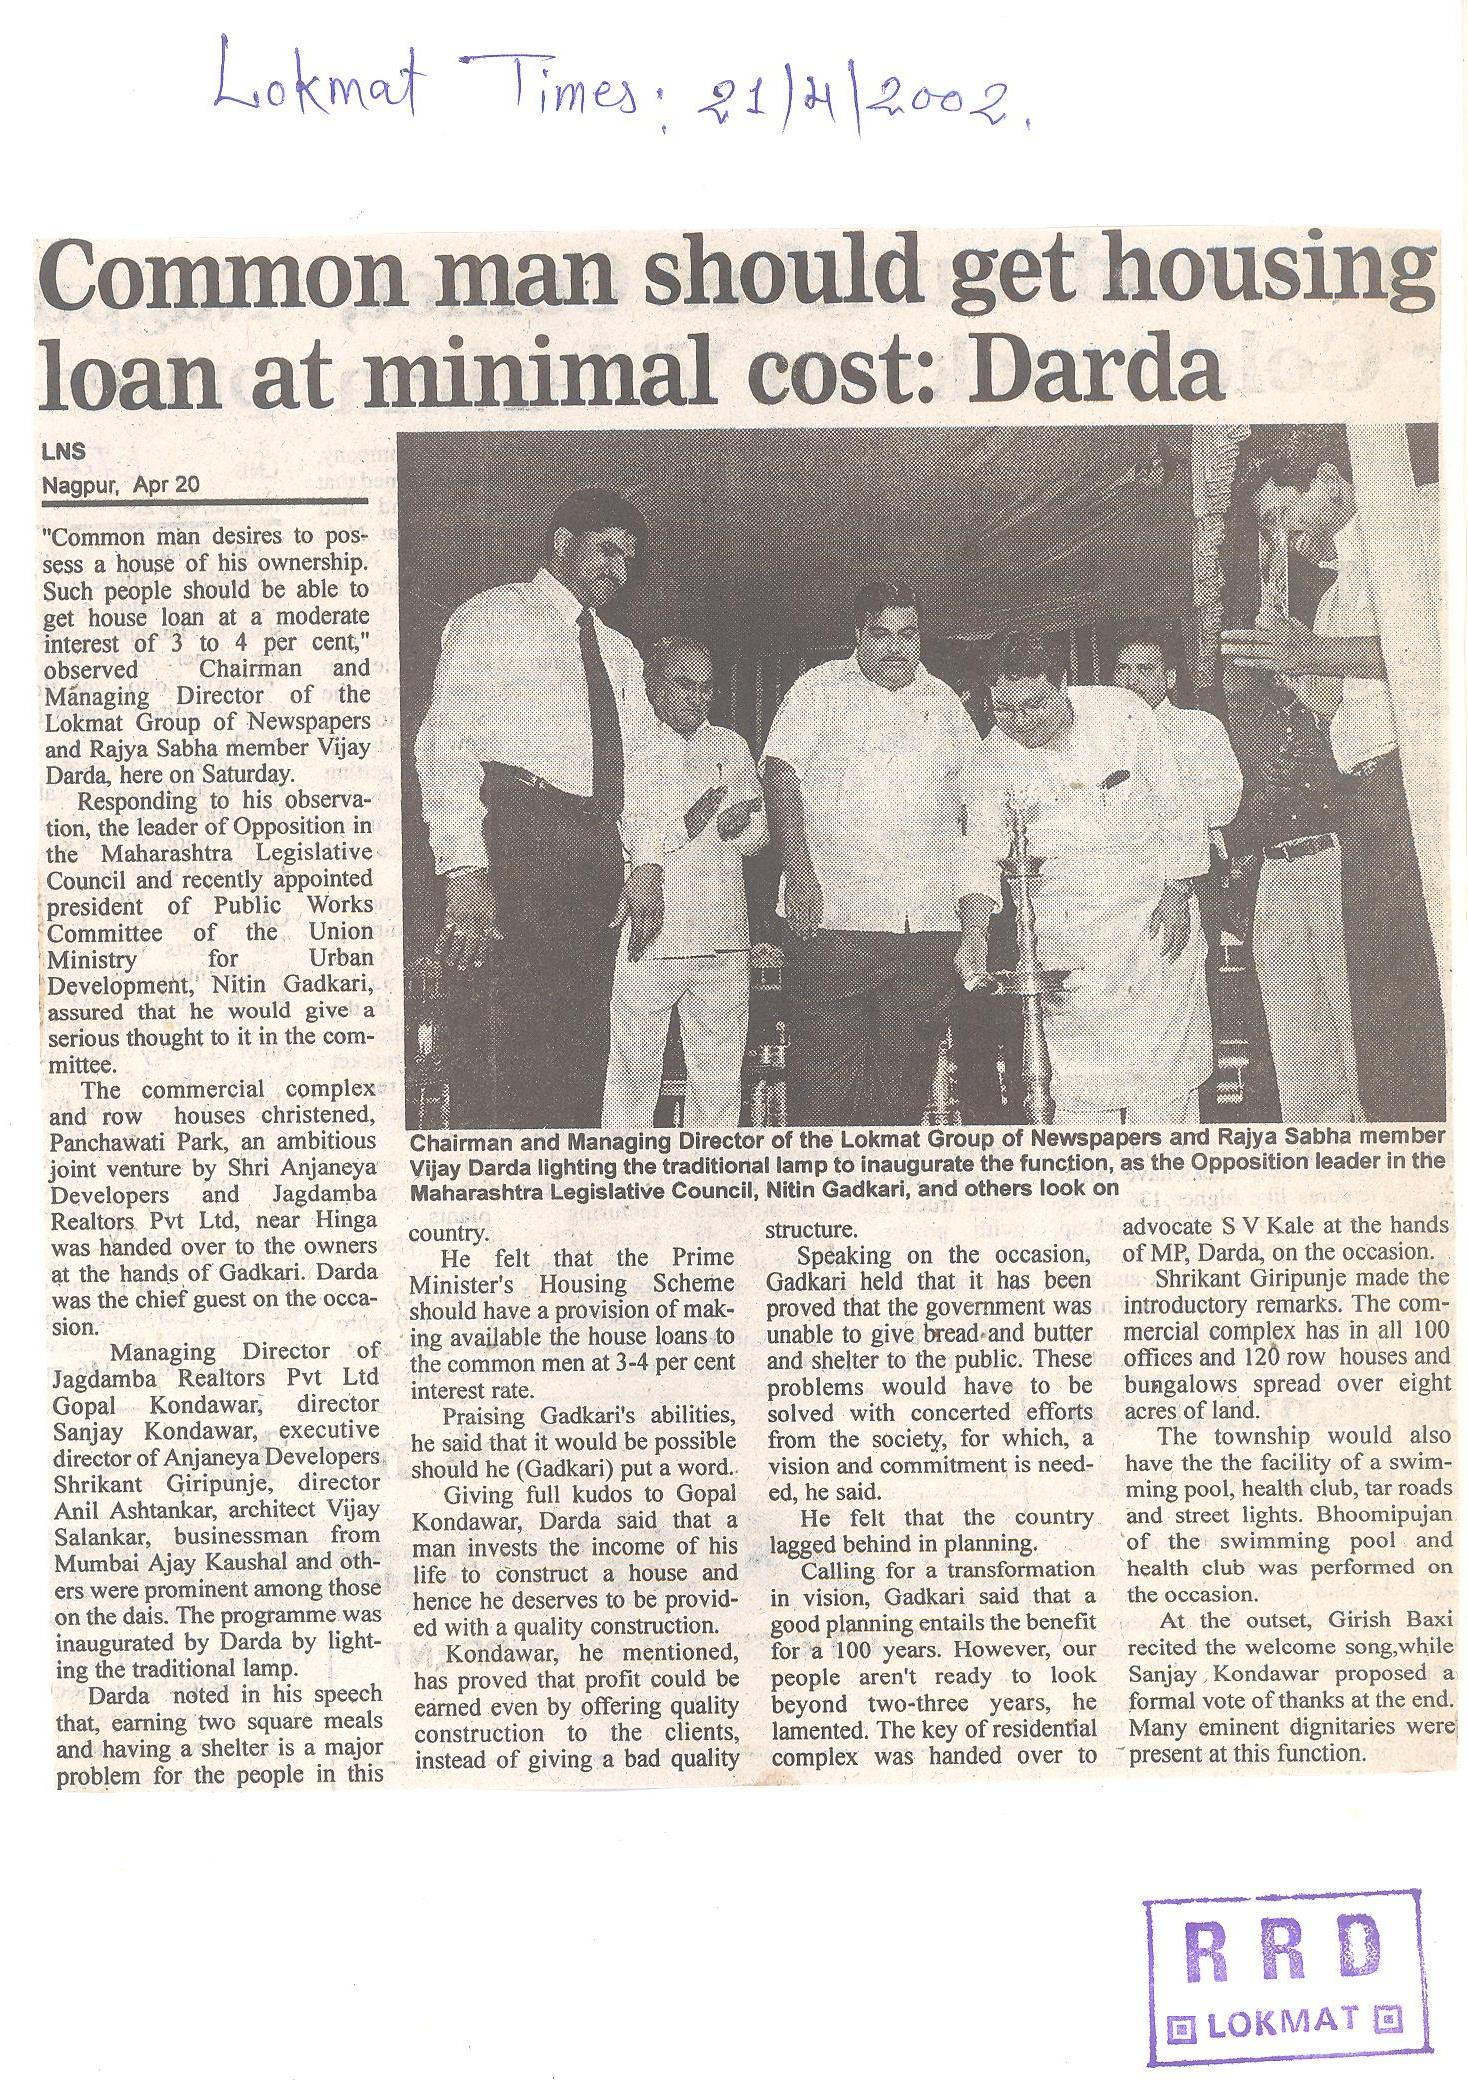 Common man should get housing loan at minimal cost: Darda